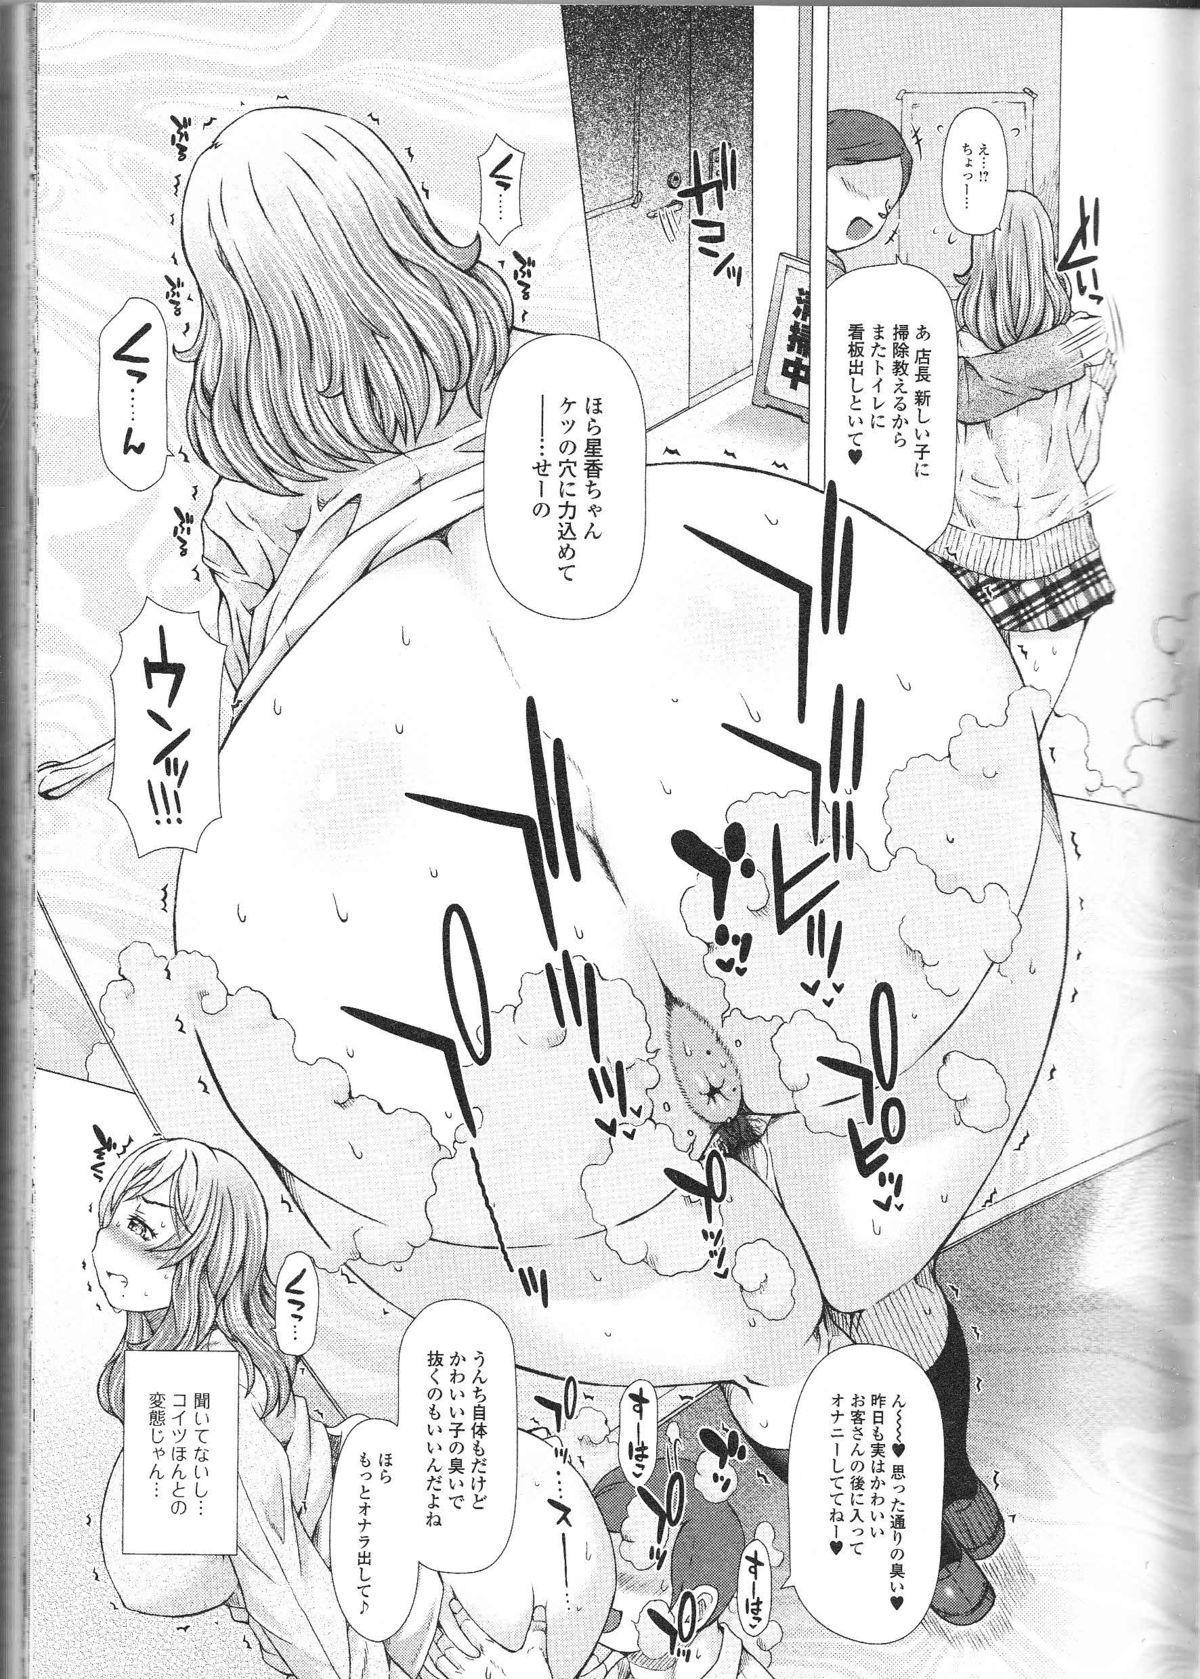 Nozoite wa Ikenai 9 - Do Not Peep! 9 35